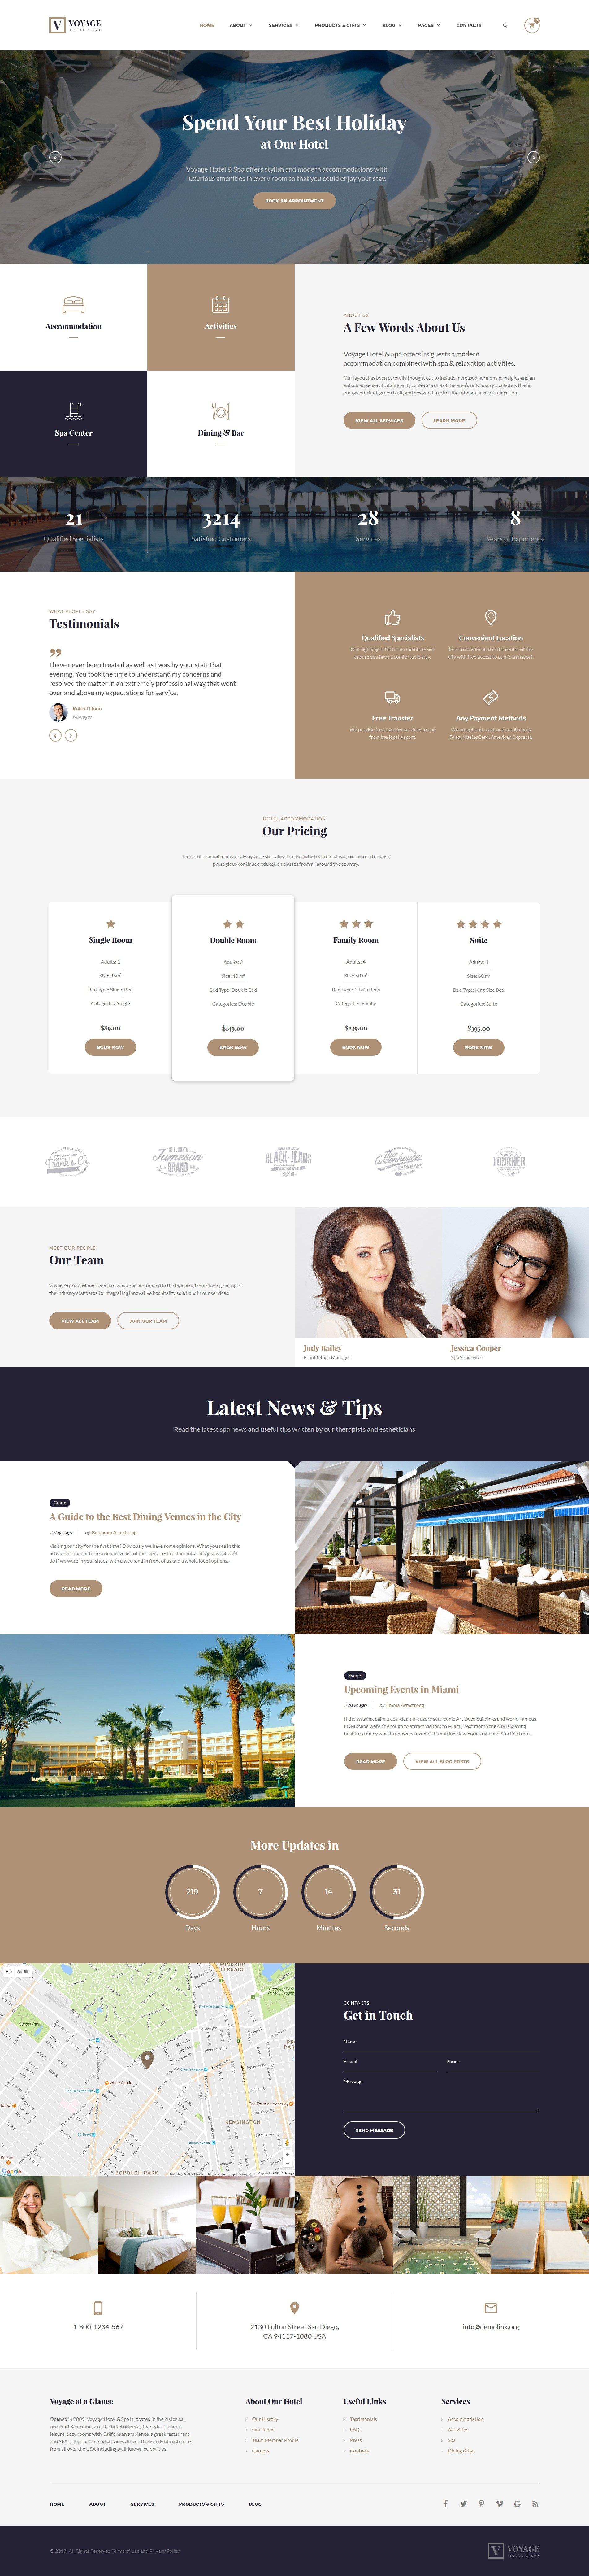 Responsive Website template over Hotels №55353 - screenshot